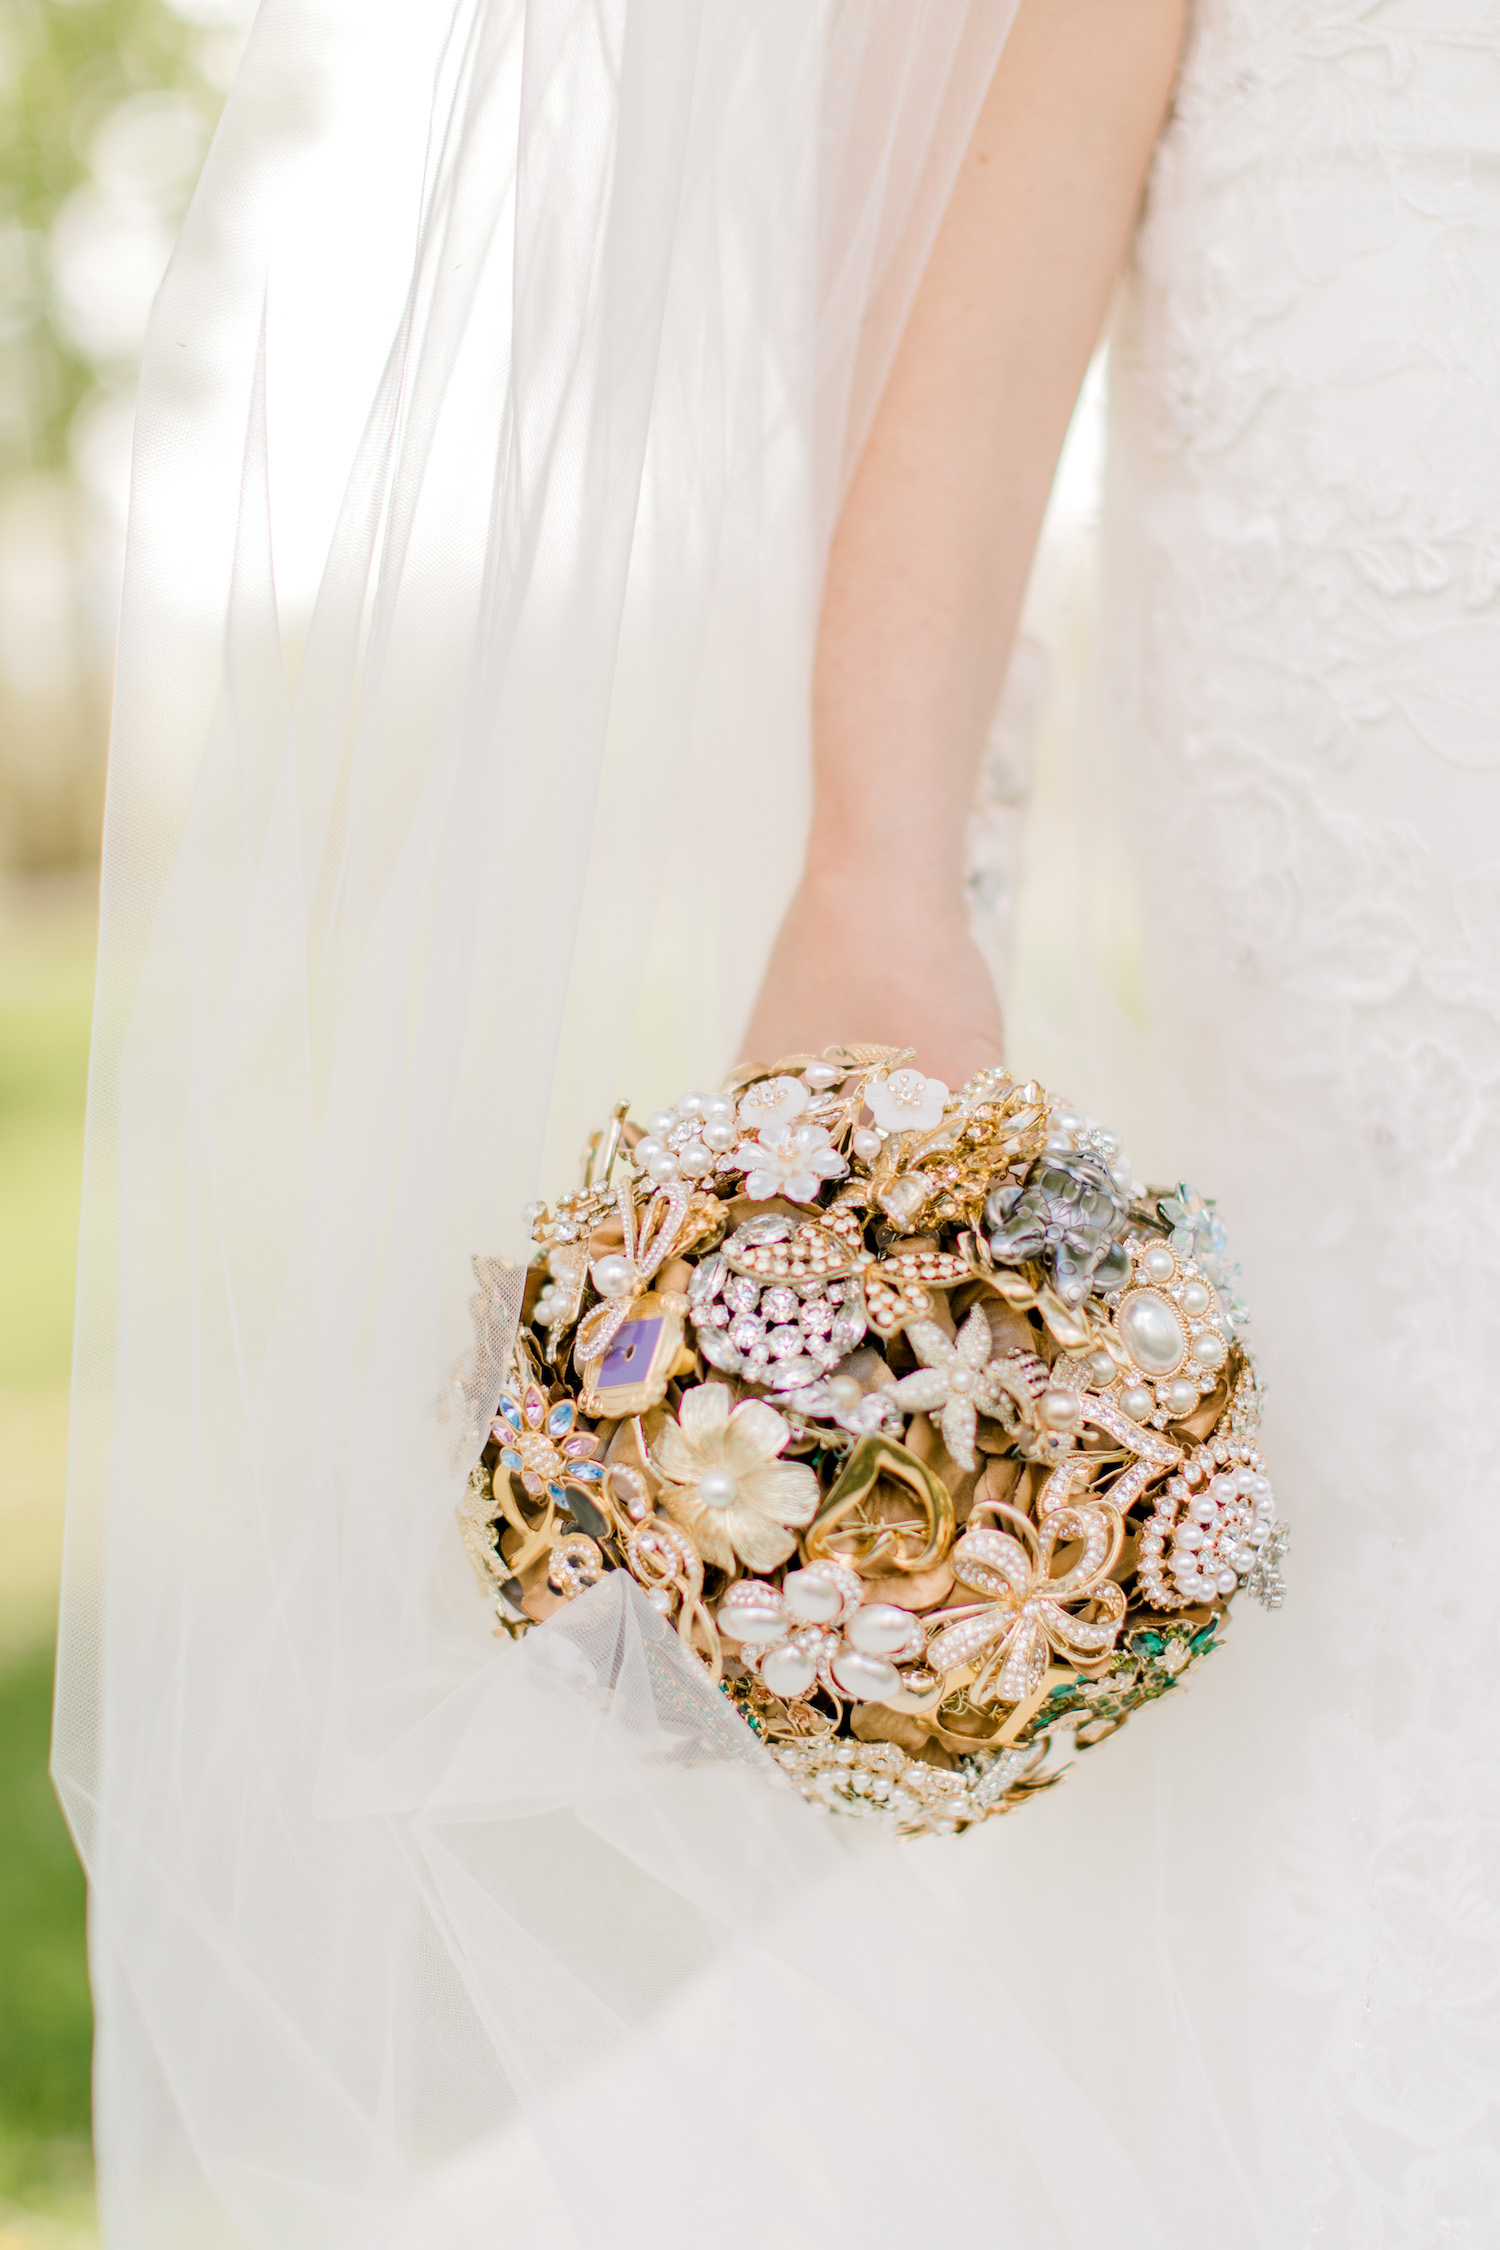 Brides bouquet for City Flats Hotel wedding